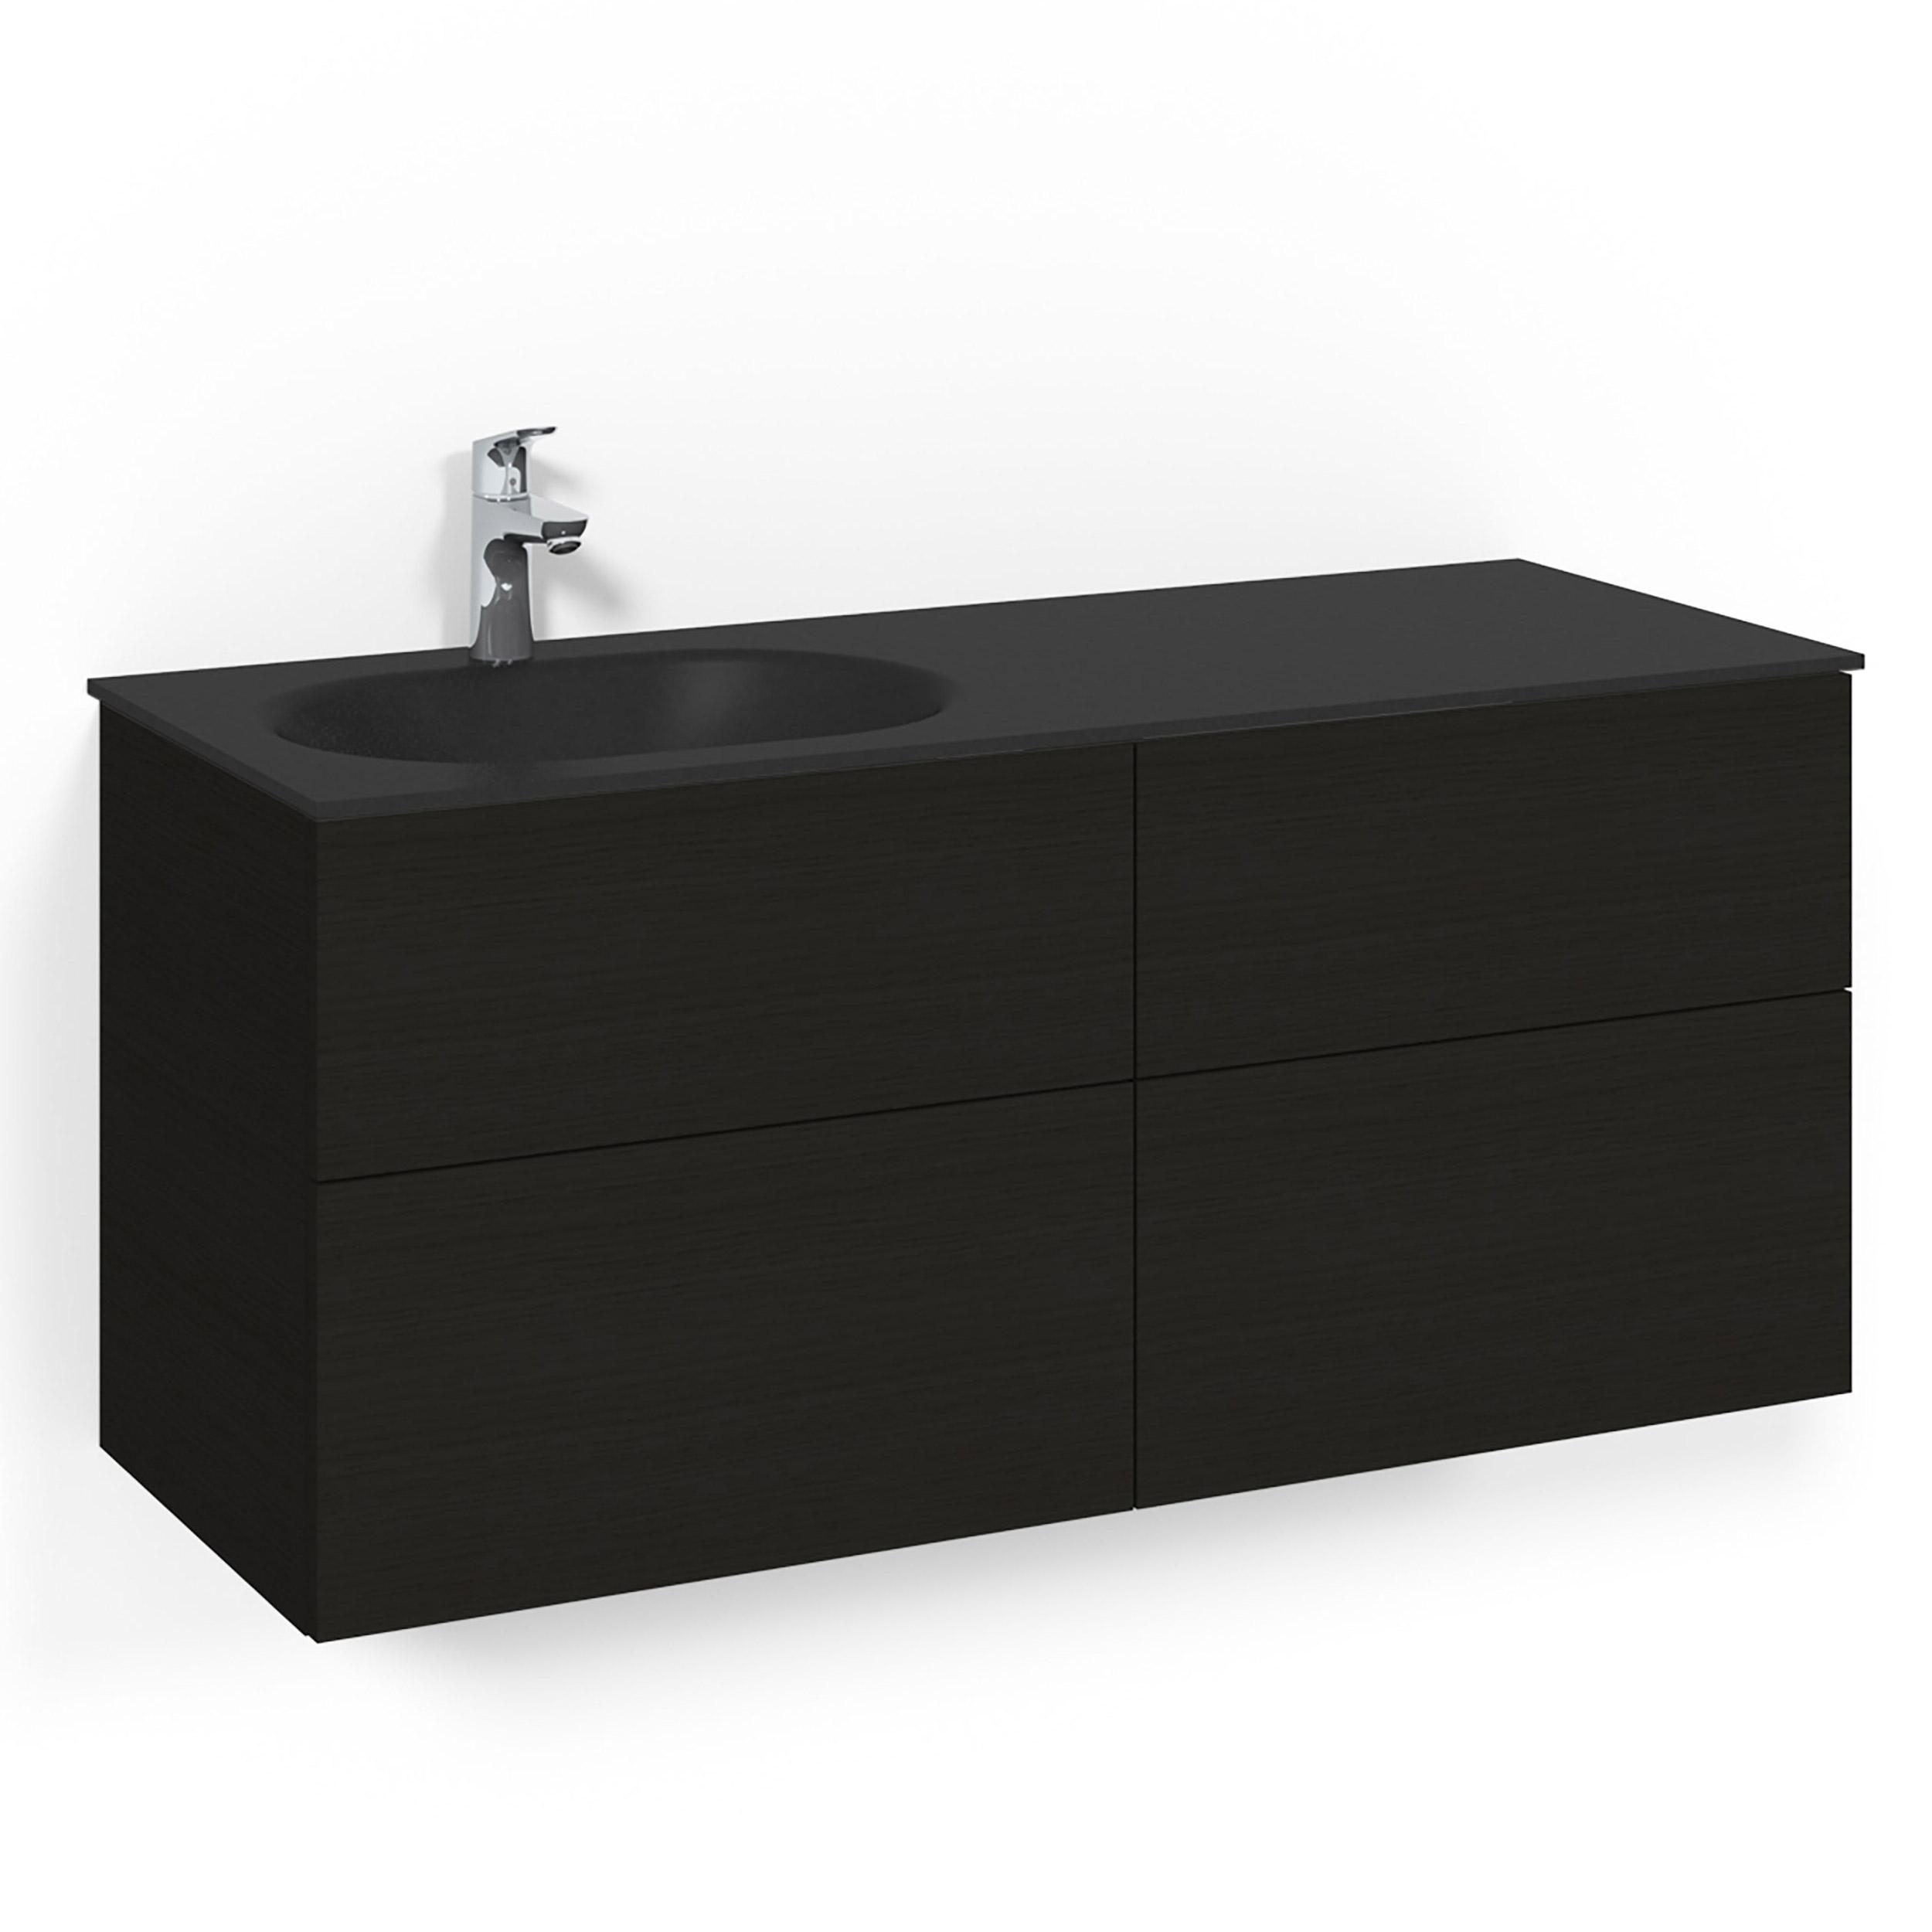 Tvättställsskåp Macro Design Crown Plain Med Glastvättställ